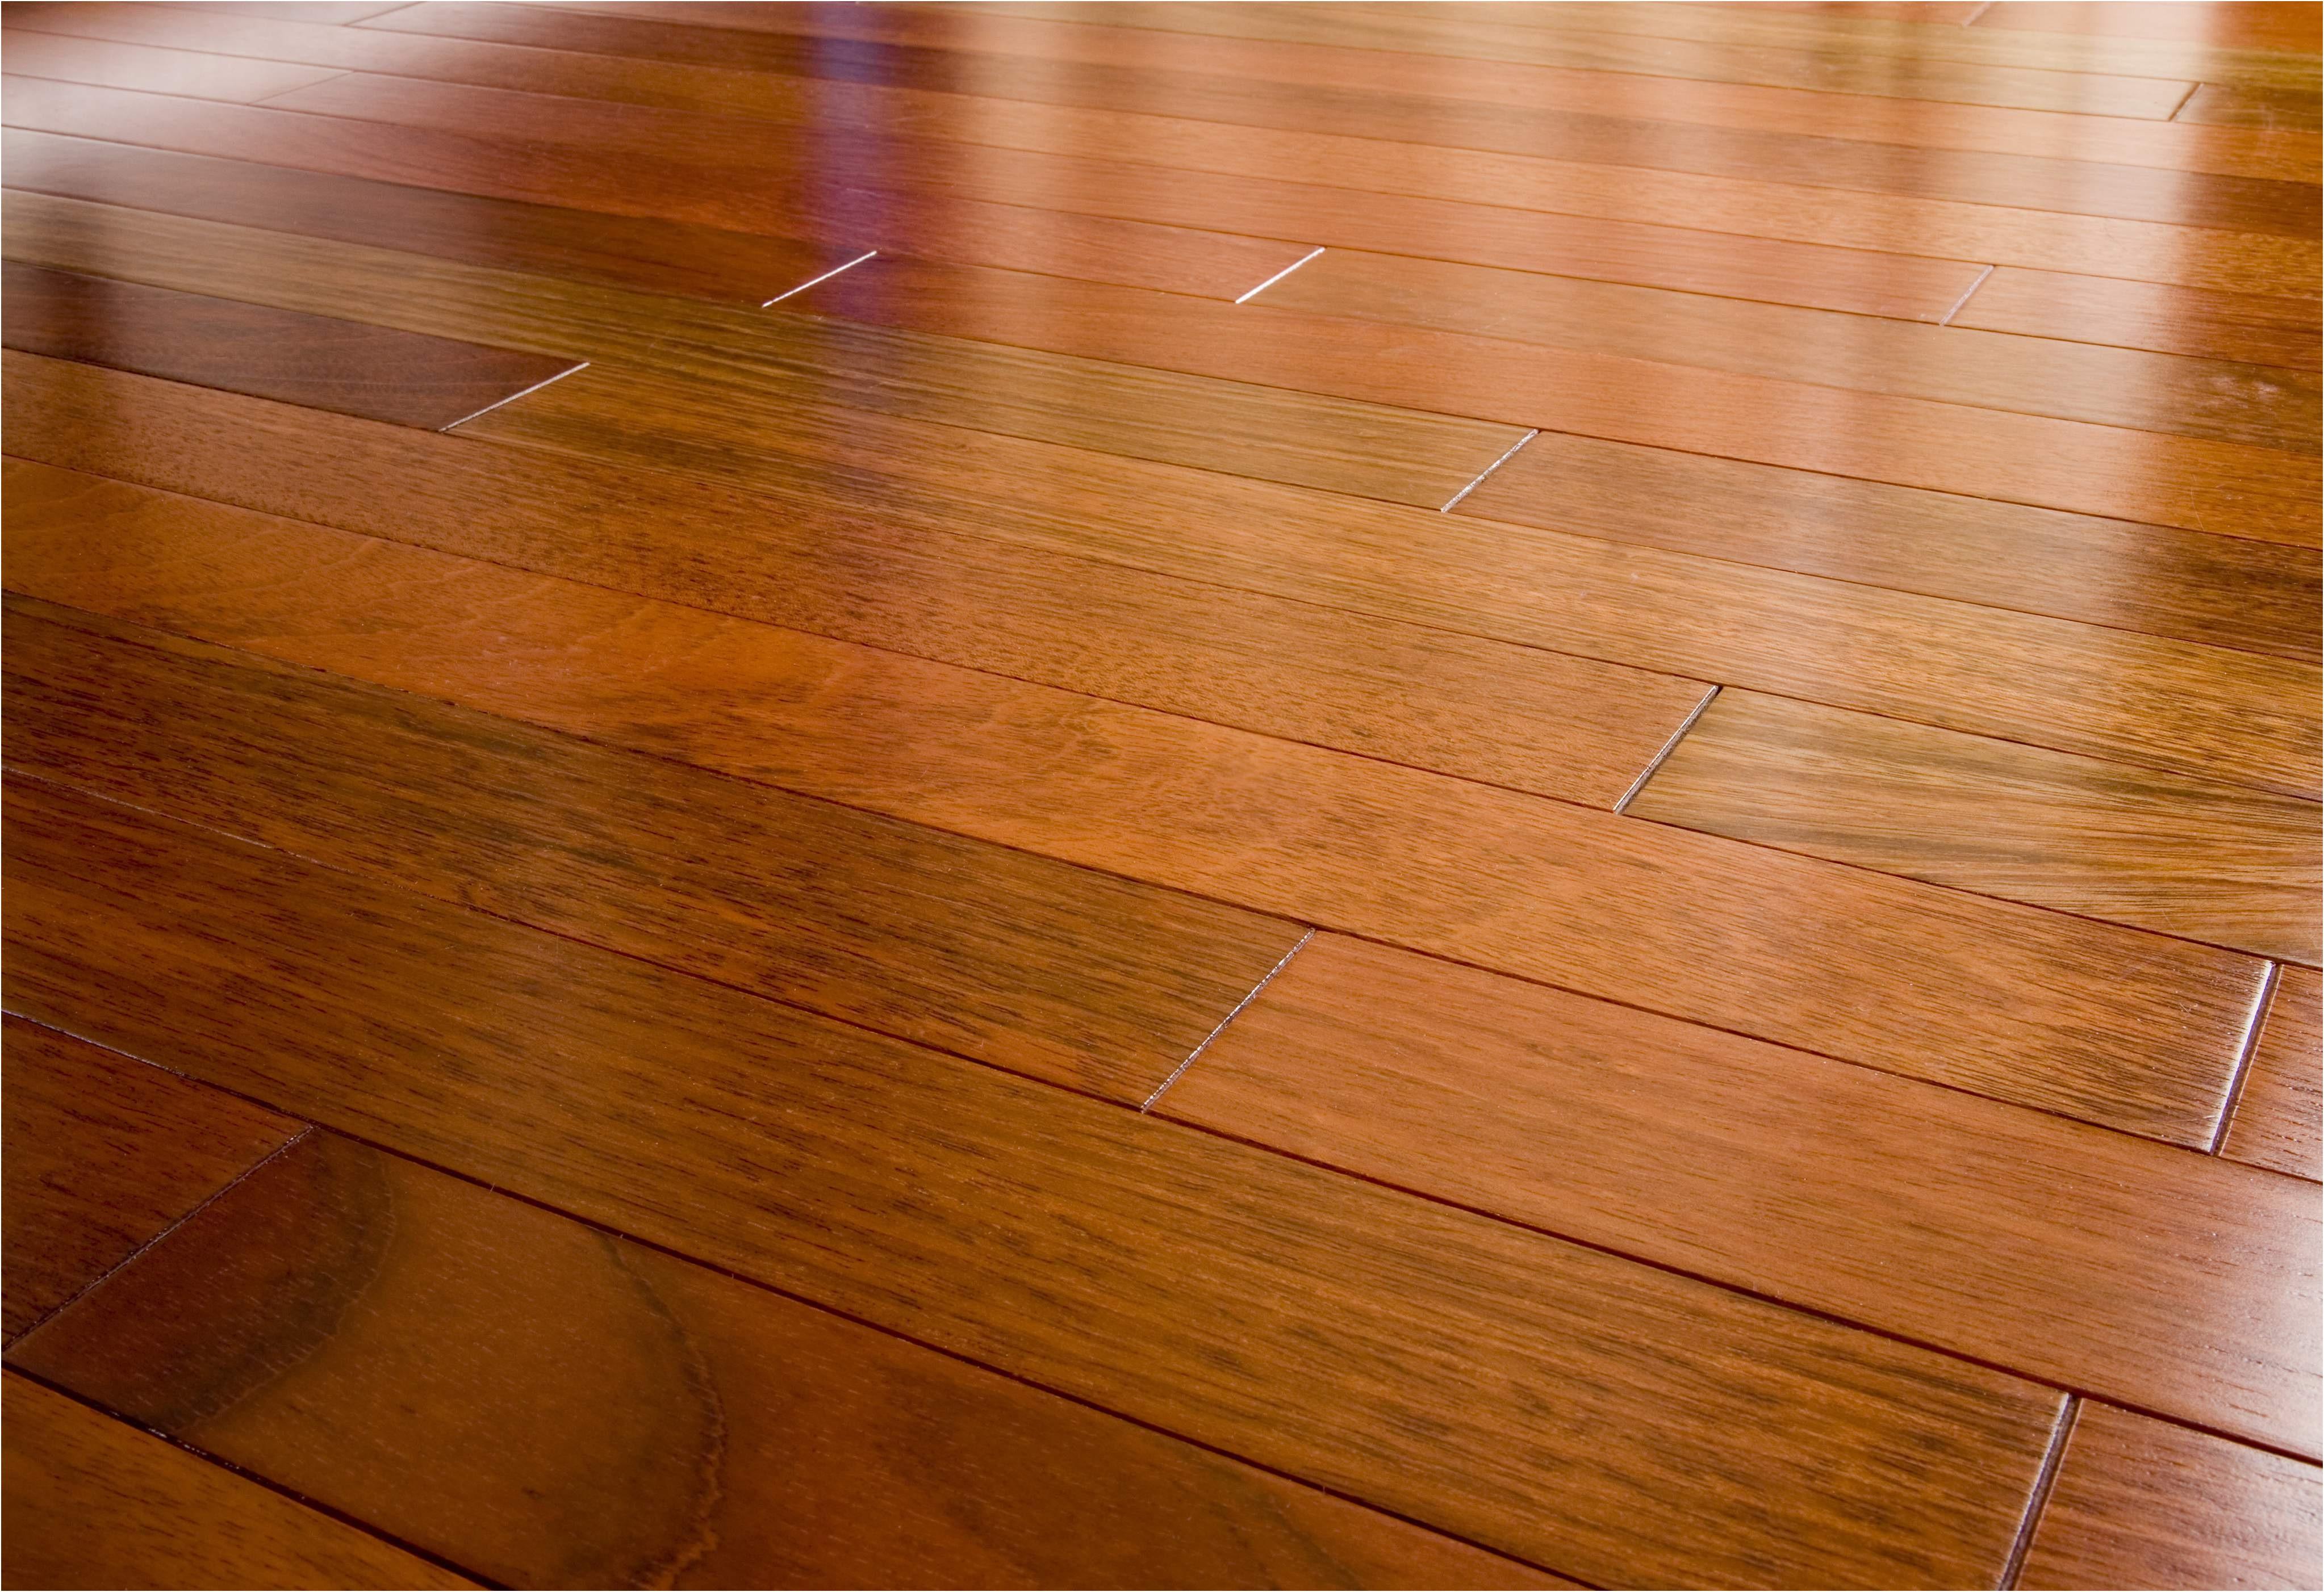 beech hardwood flooring cost of unfinished hardwood flooring for sale elegant ideas engineeredod within related post